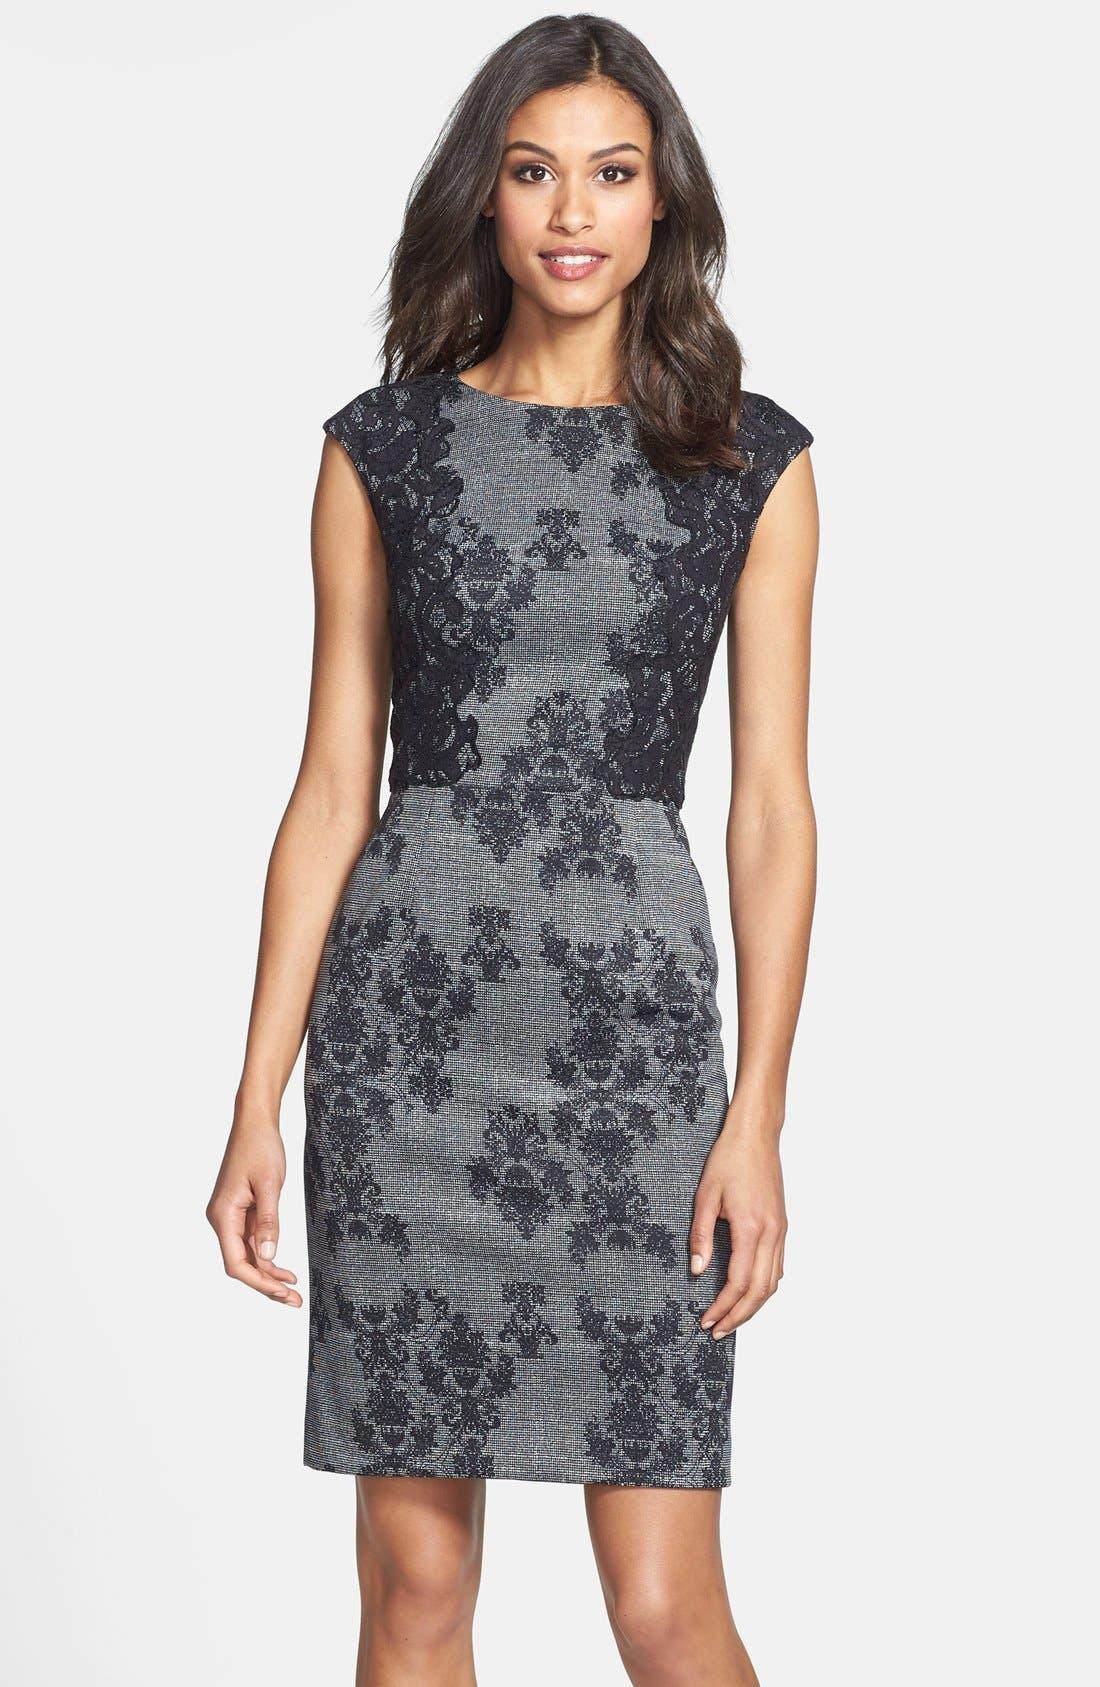 Main Image - Adrianna Papell Placed & Print Lace Sheath Dress (Regular & Petite)